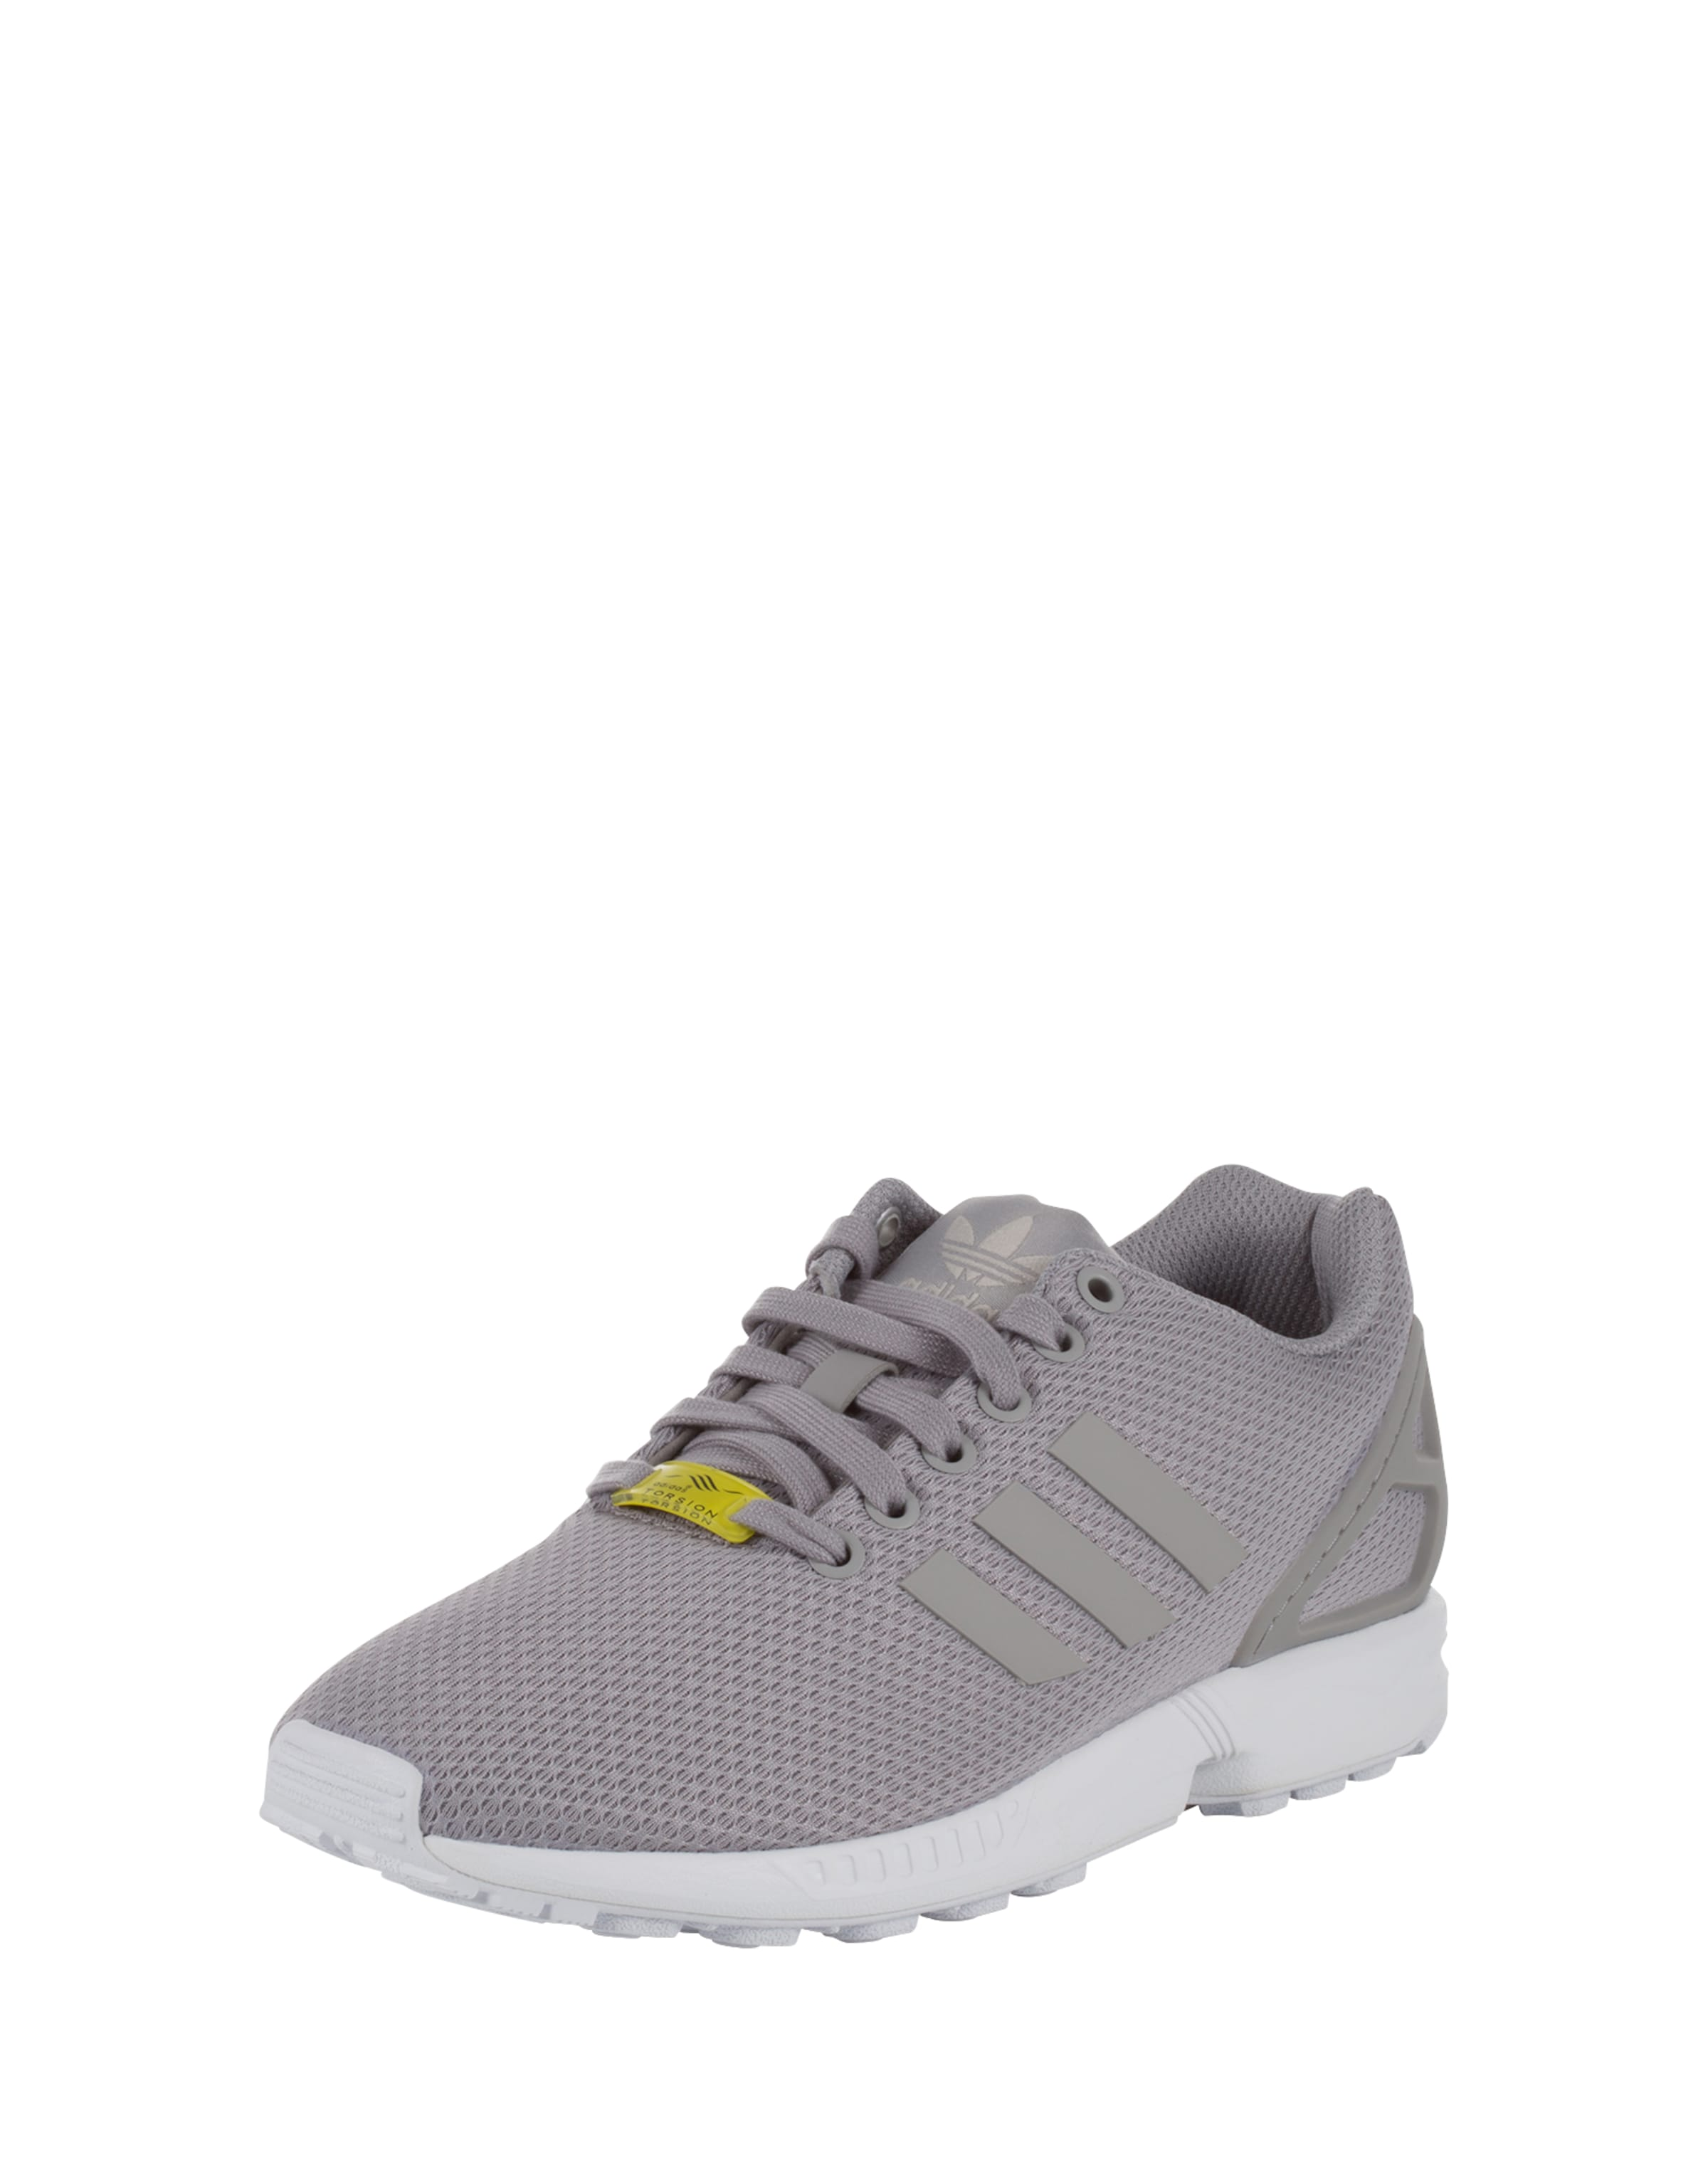 ADIDAS ORIGINALS Sneaker ZX Flux Hohe Qualität